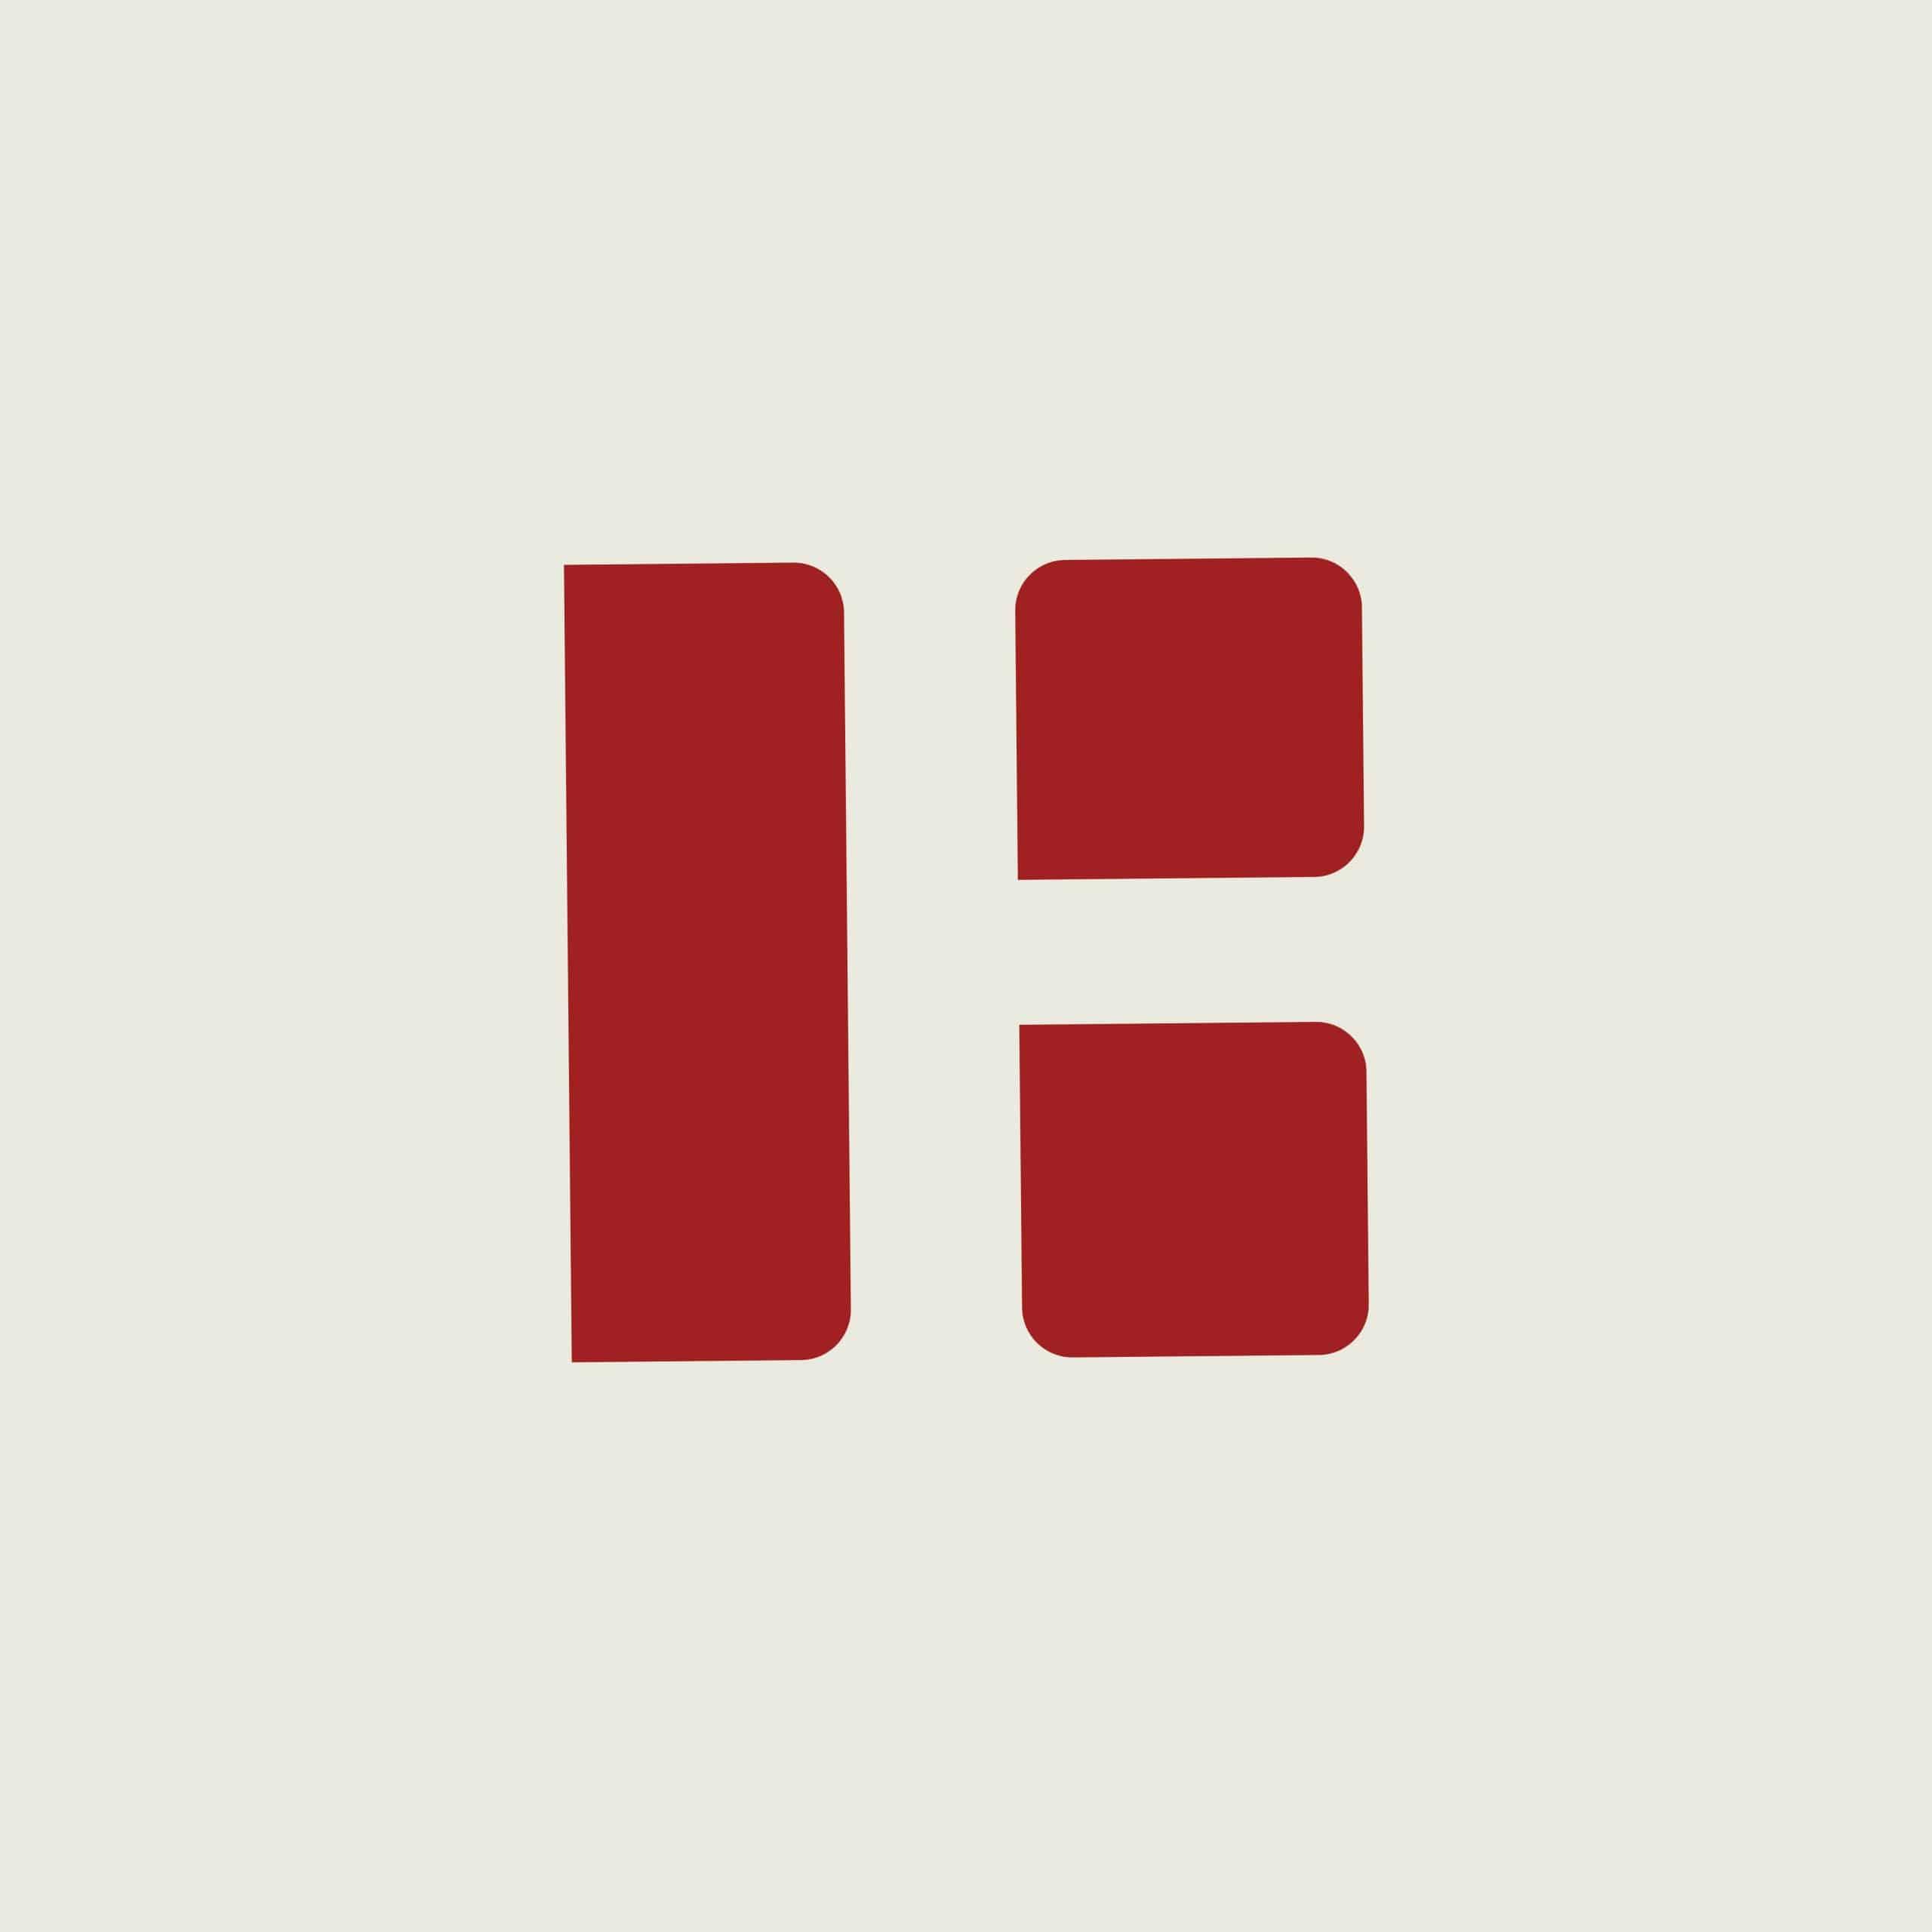 Stellen_Design_Harvey_esquire_Branding_Horizontal